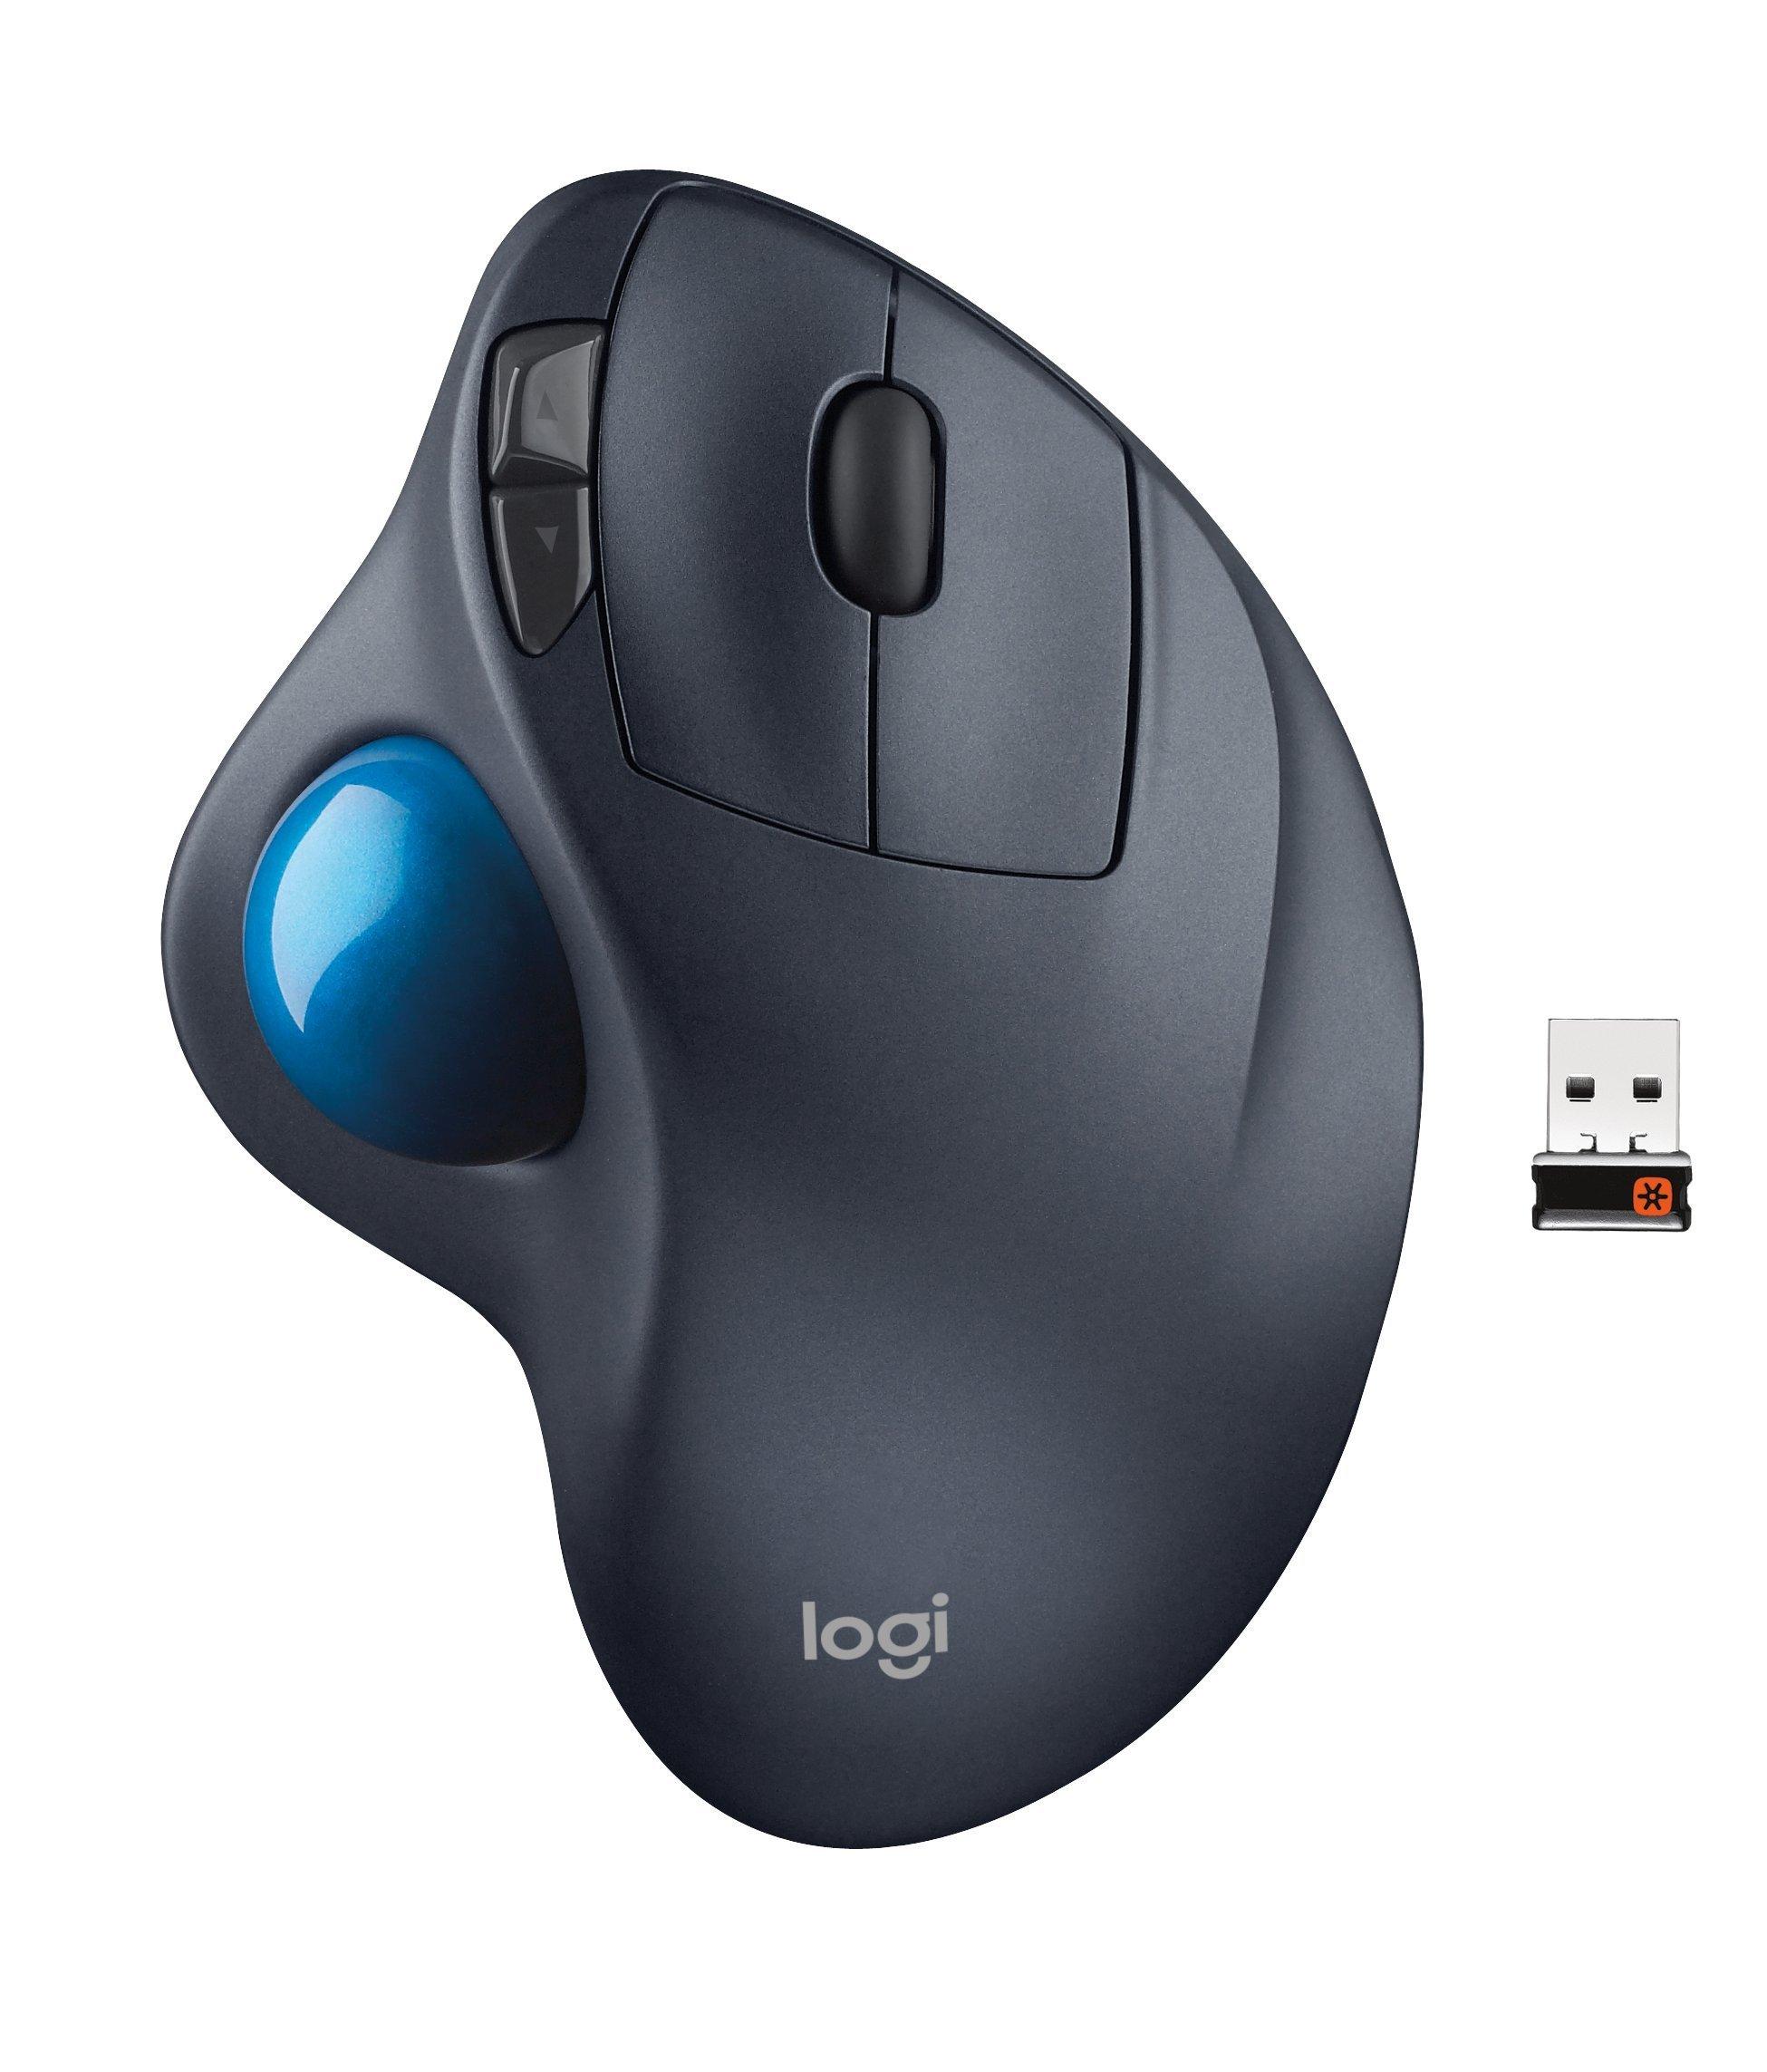 Logitech Wireless Trackball M570 (Renewed) by Logitech